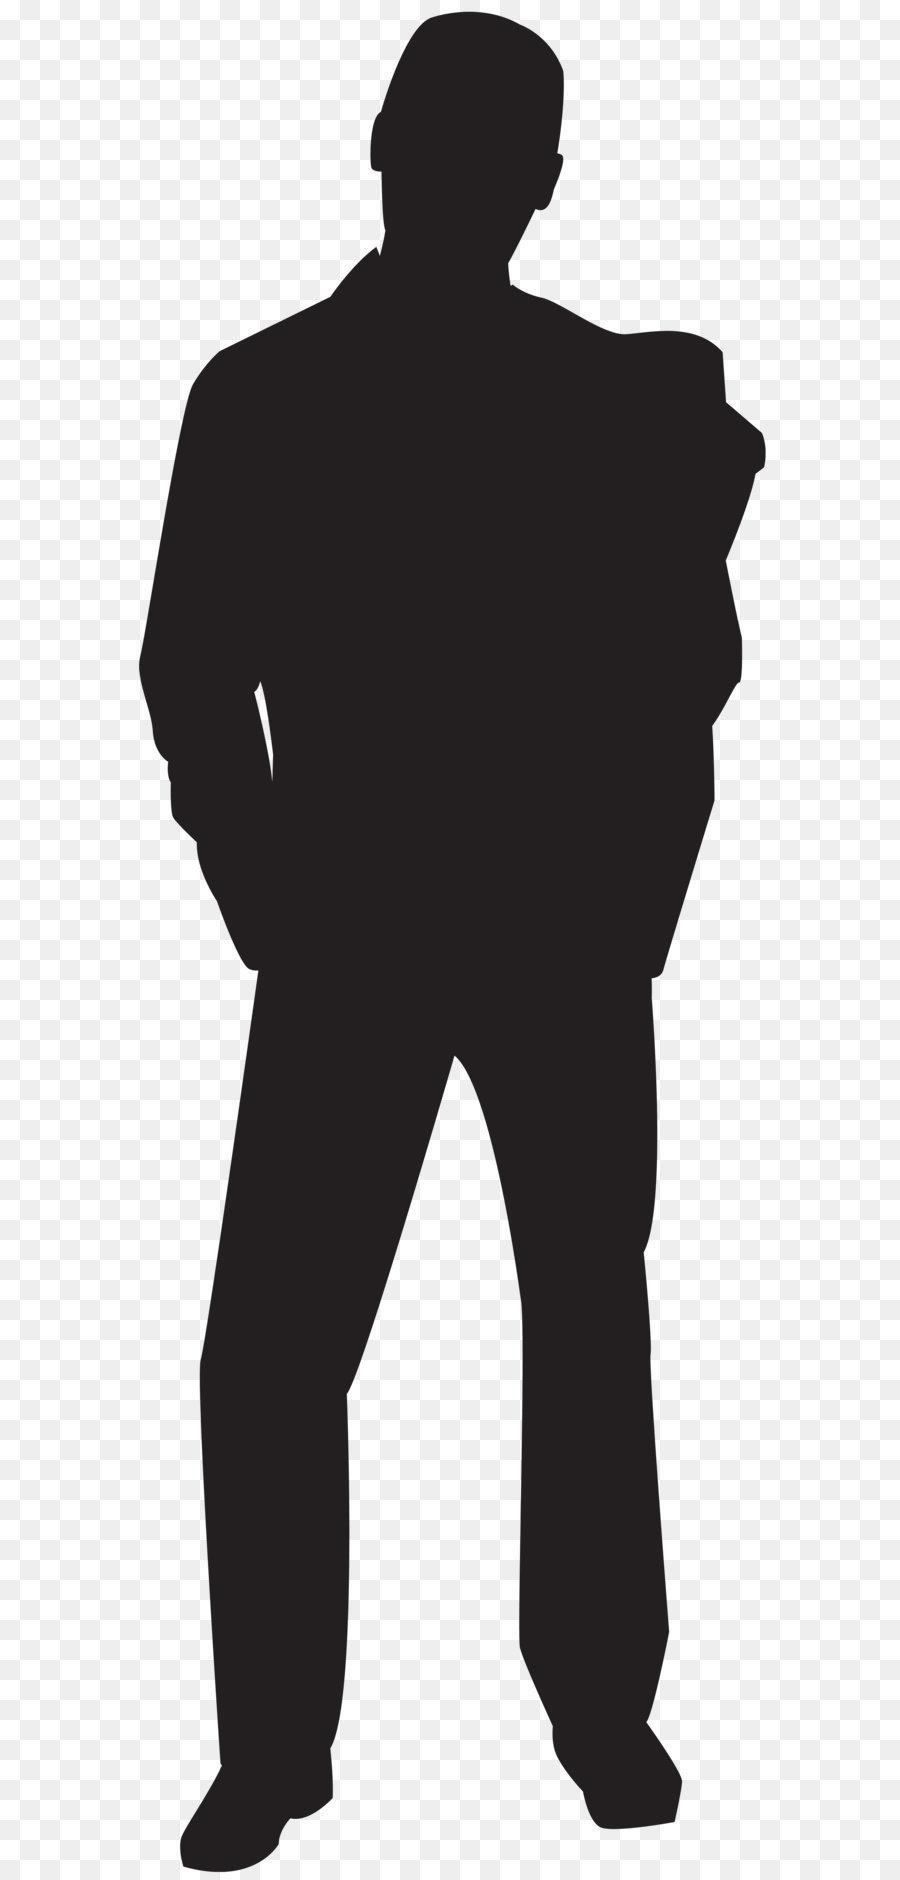 Male Silhouette Free Idea png